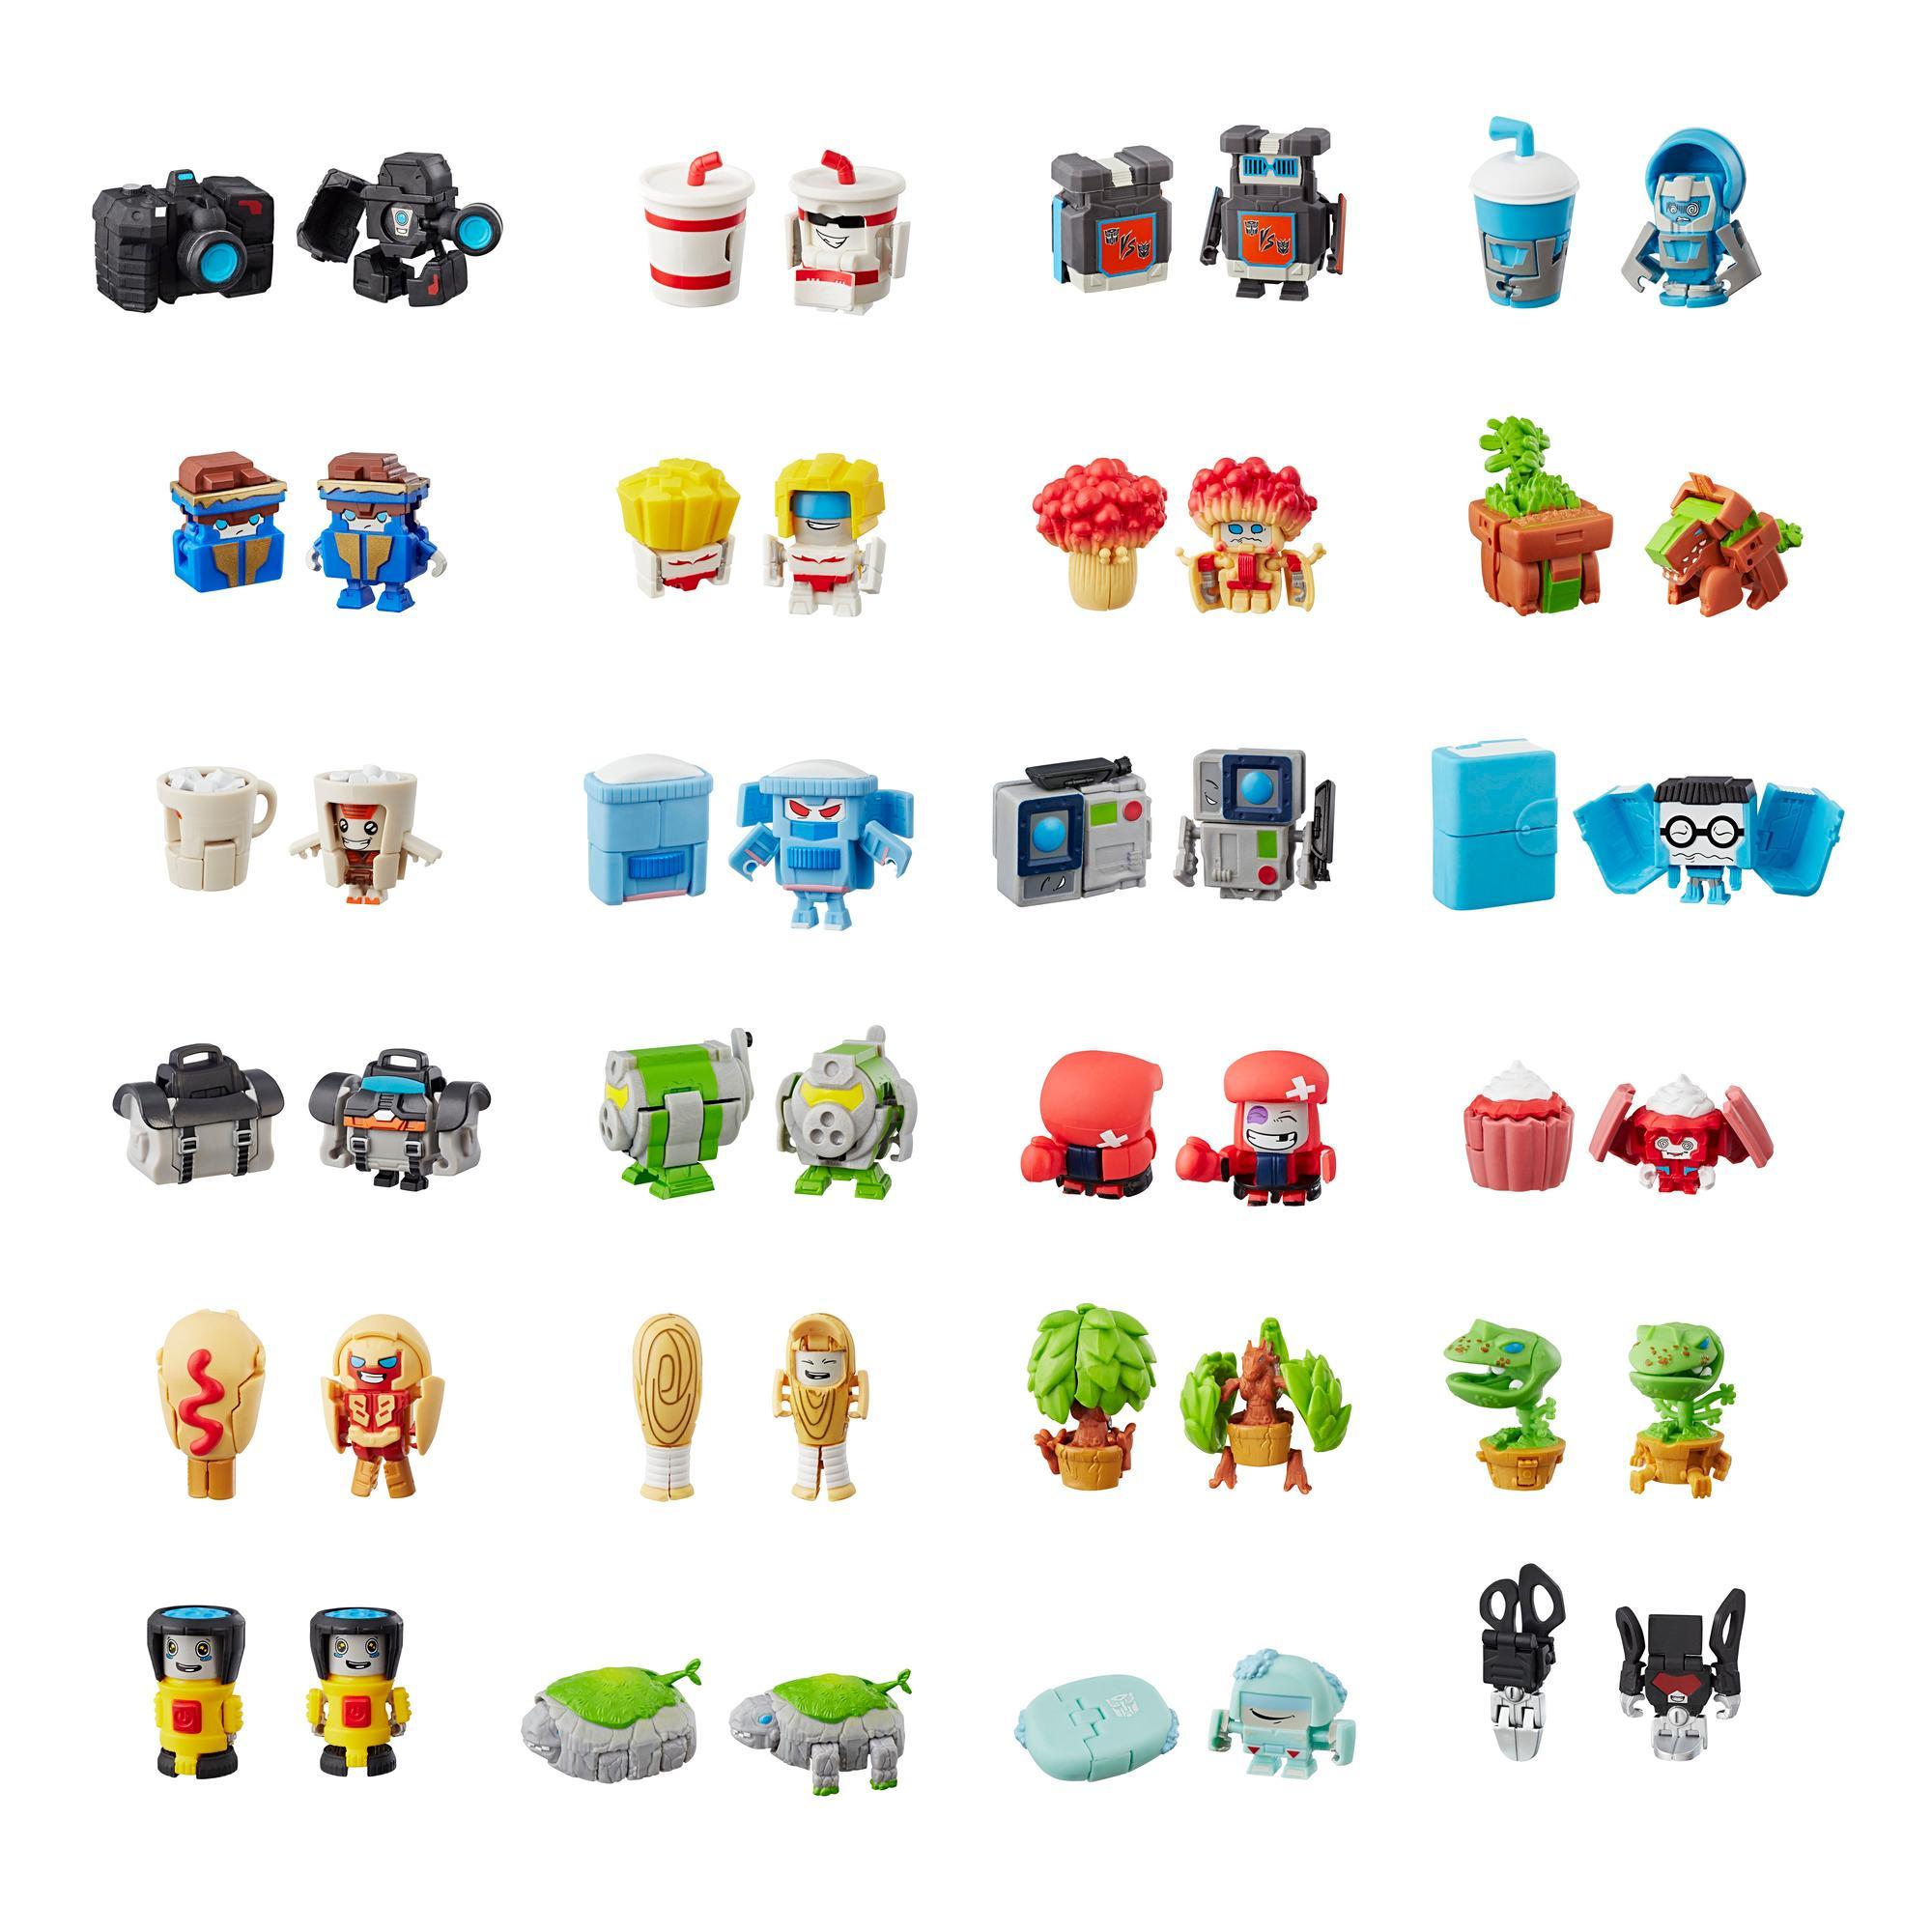 Transformers BotBots Serie 1 Figura misterio coleccionable de empaque sorpresa --  ¡Juguete sorpresa 2 en 1!